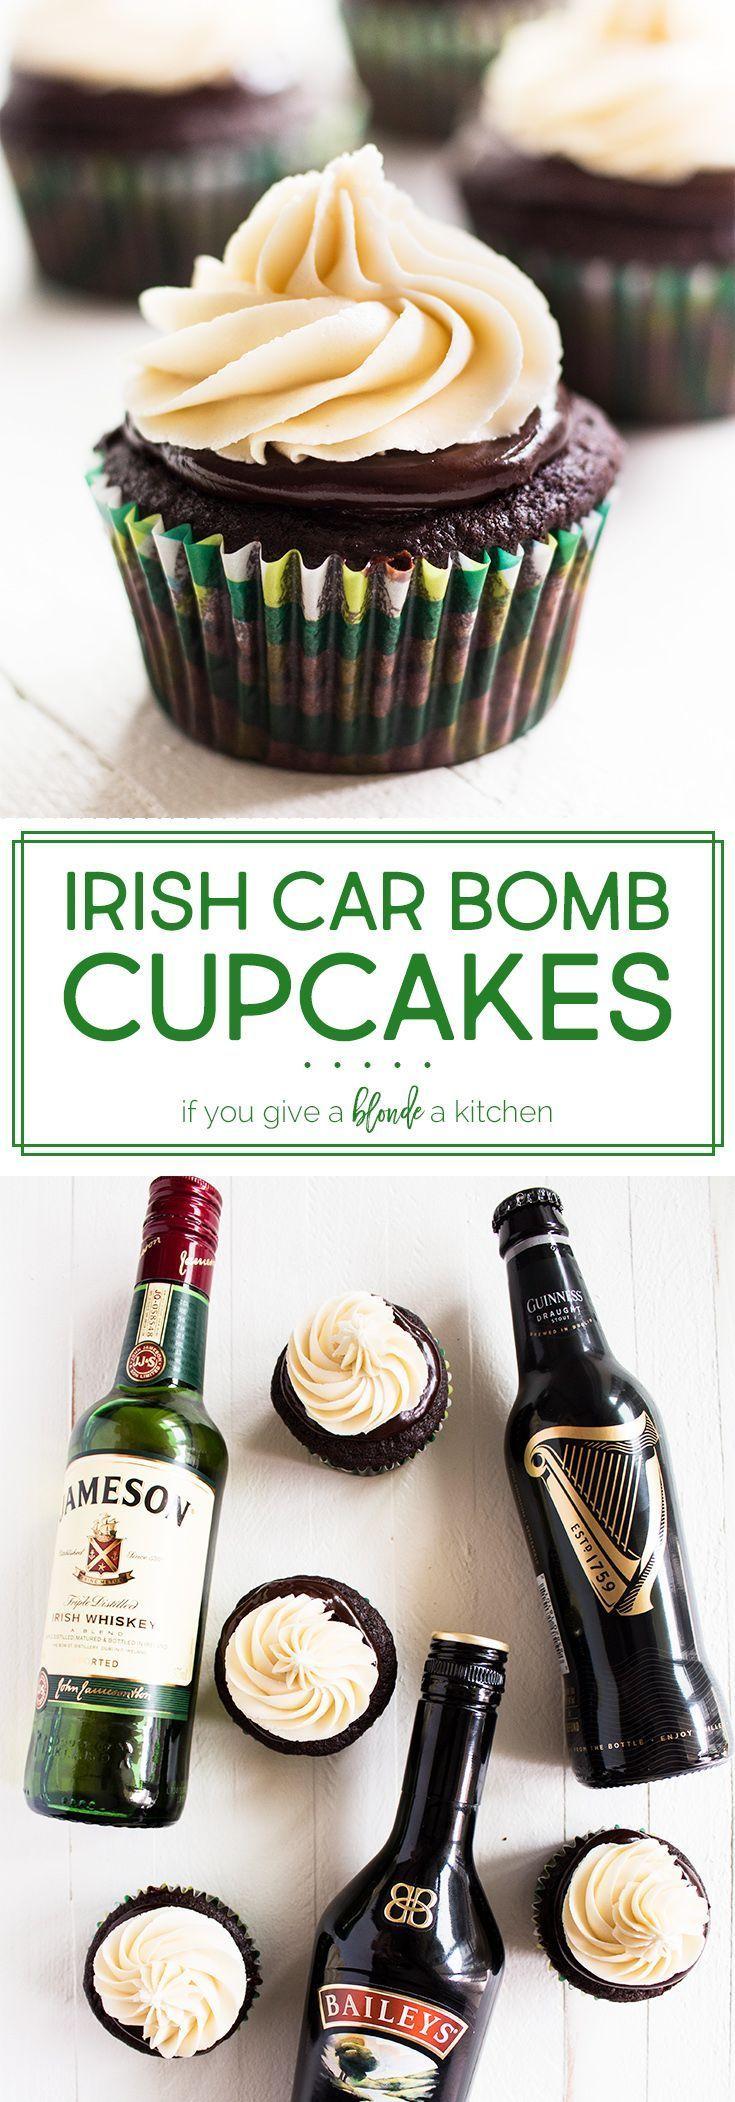 Photo of Irish Car Bomb Cupcakes – #Bomb #Car #Cupcakes #Irish